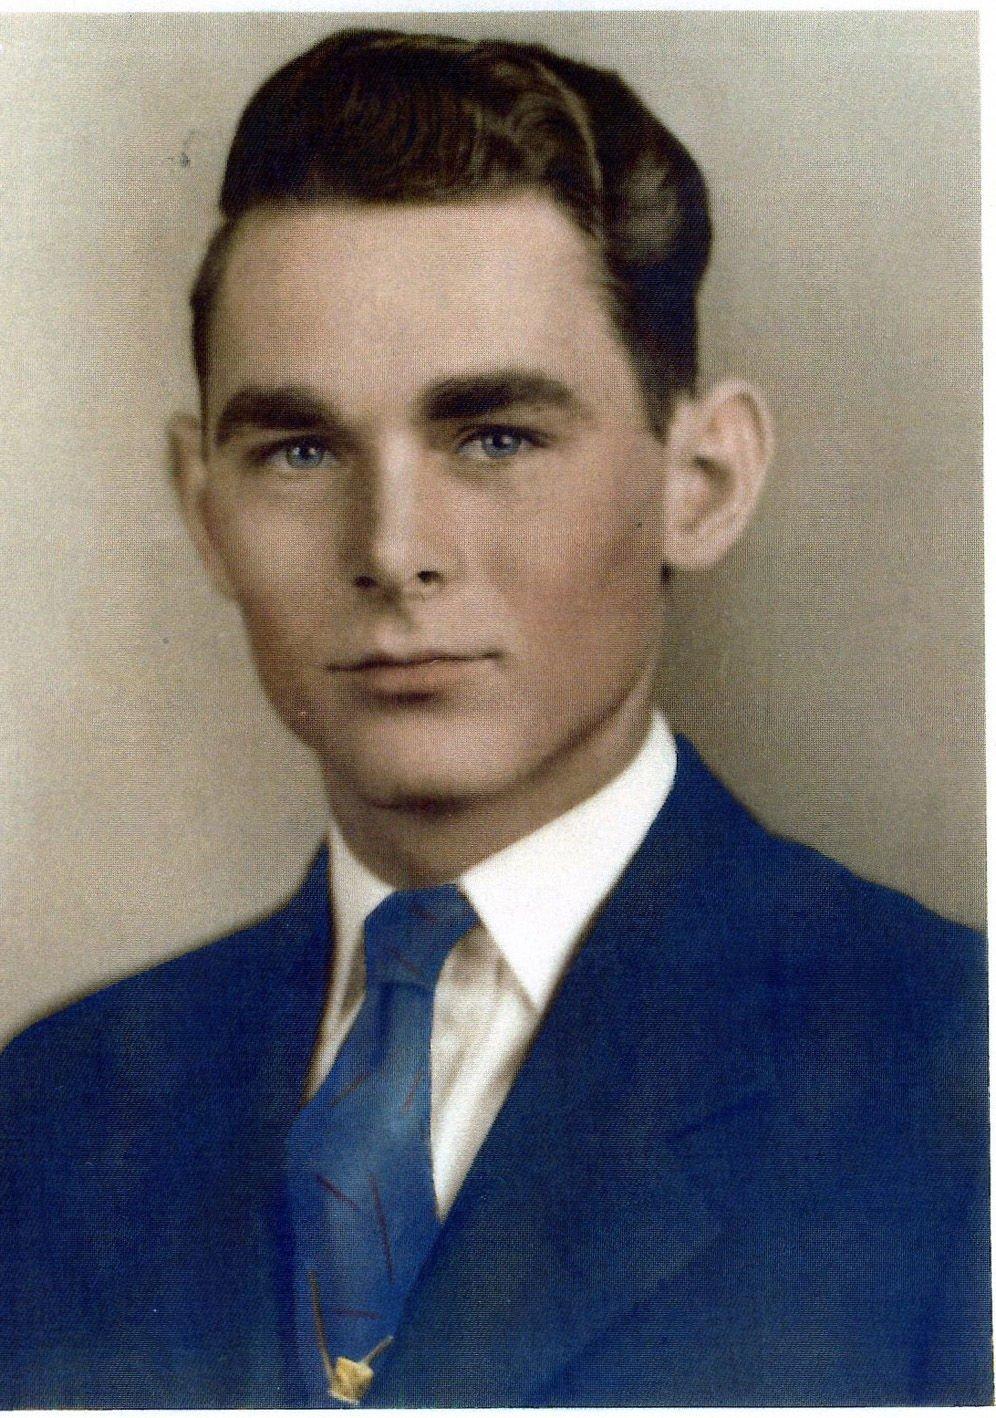 Happy 90th birthday, Dad